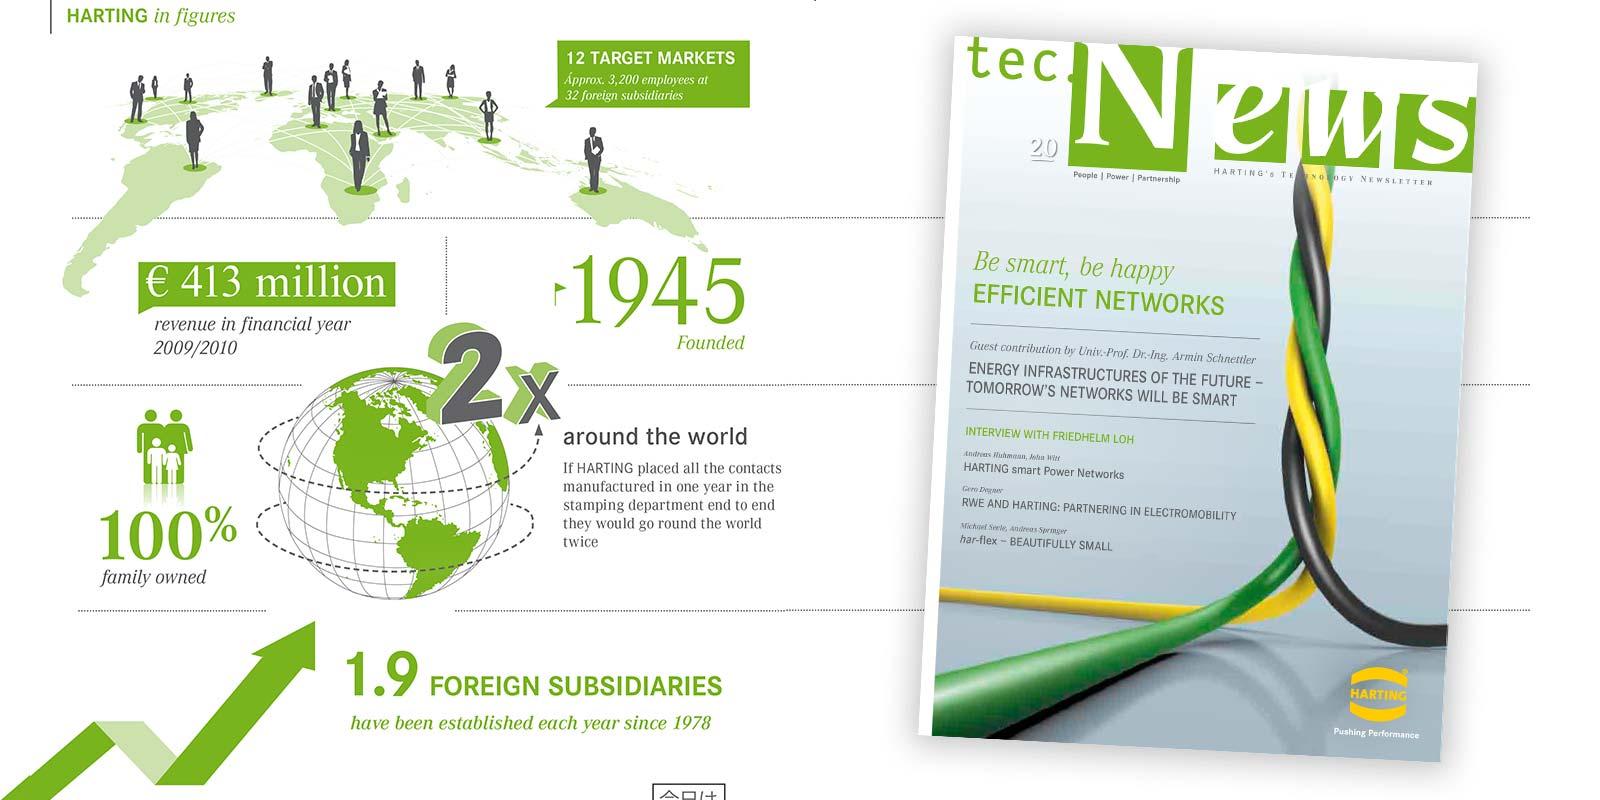 Technology Newsletter tec News | HARTING Technology Group